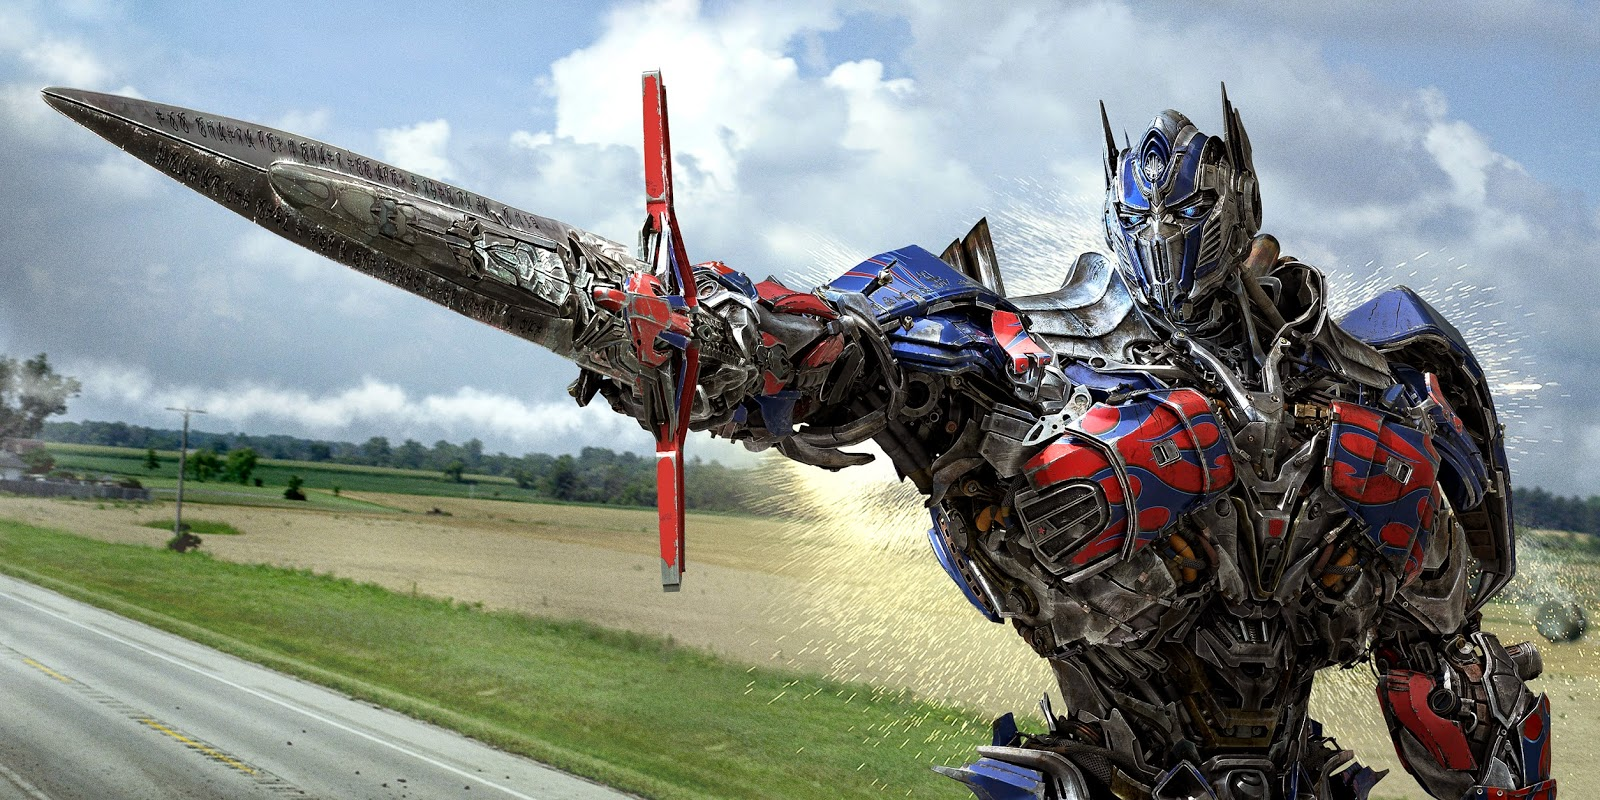 Transformers 4 | Teaser Trailer